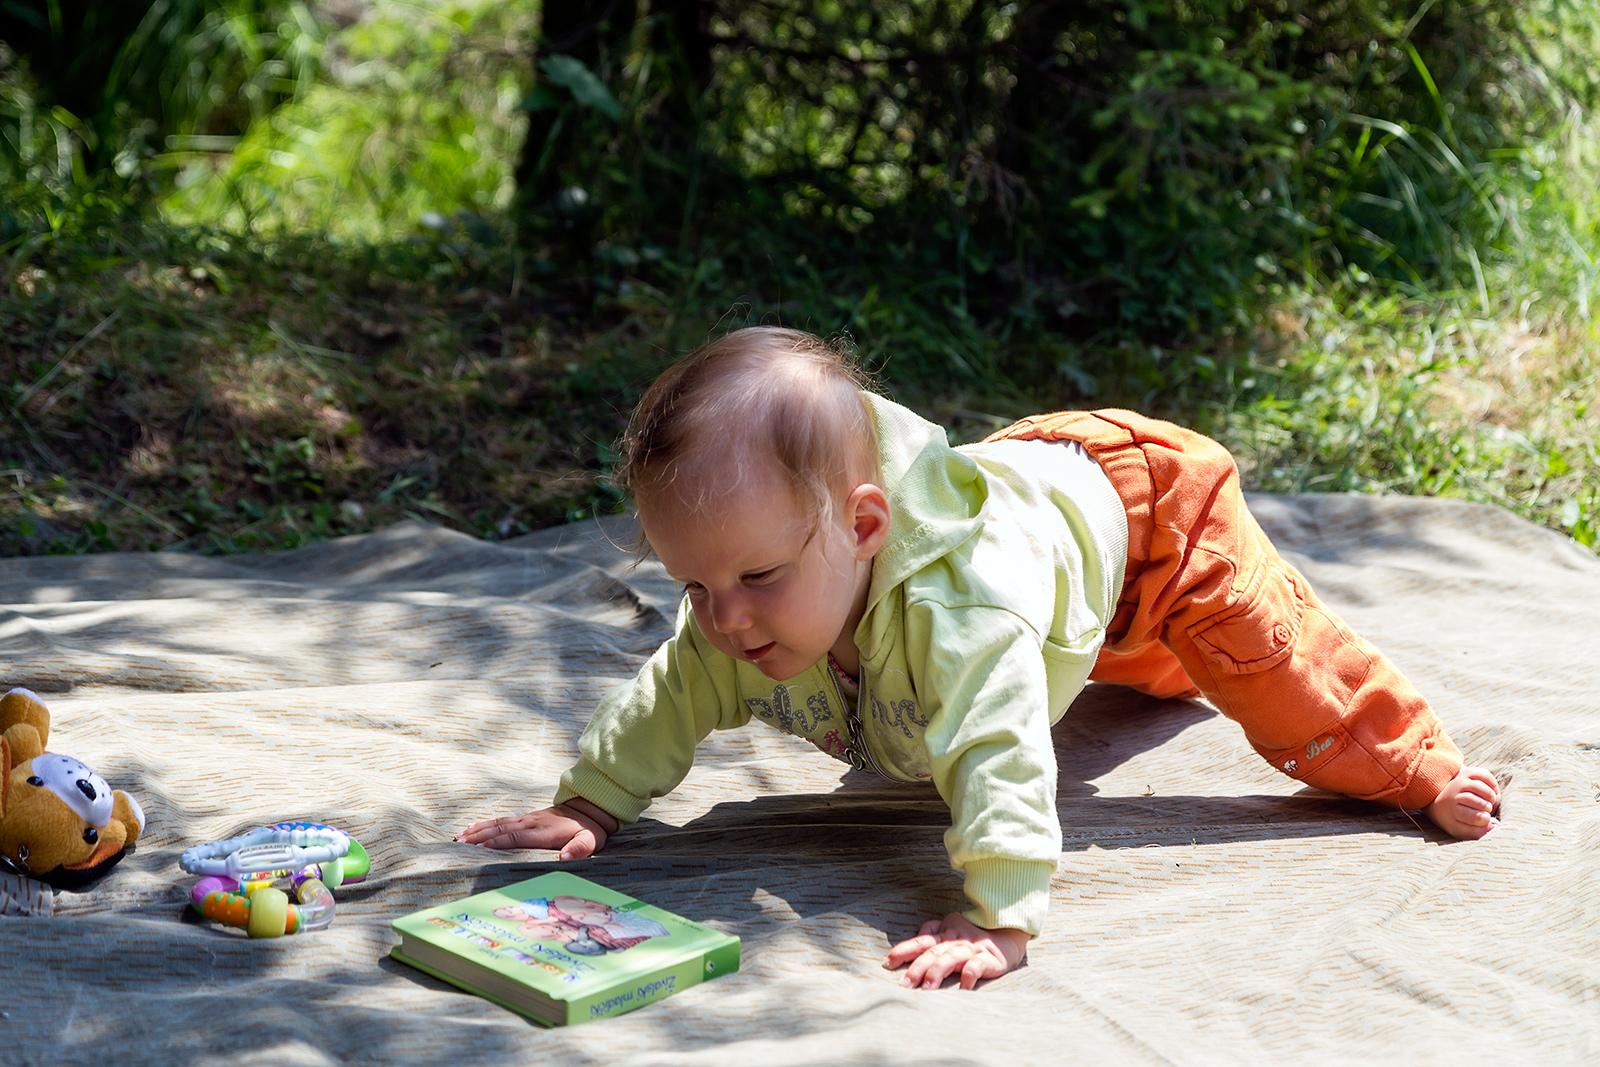 First attempts at crawling. Cheile Jietului near Petrosani, Romania.